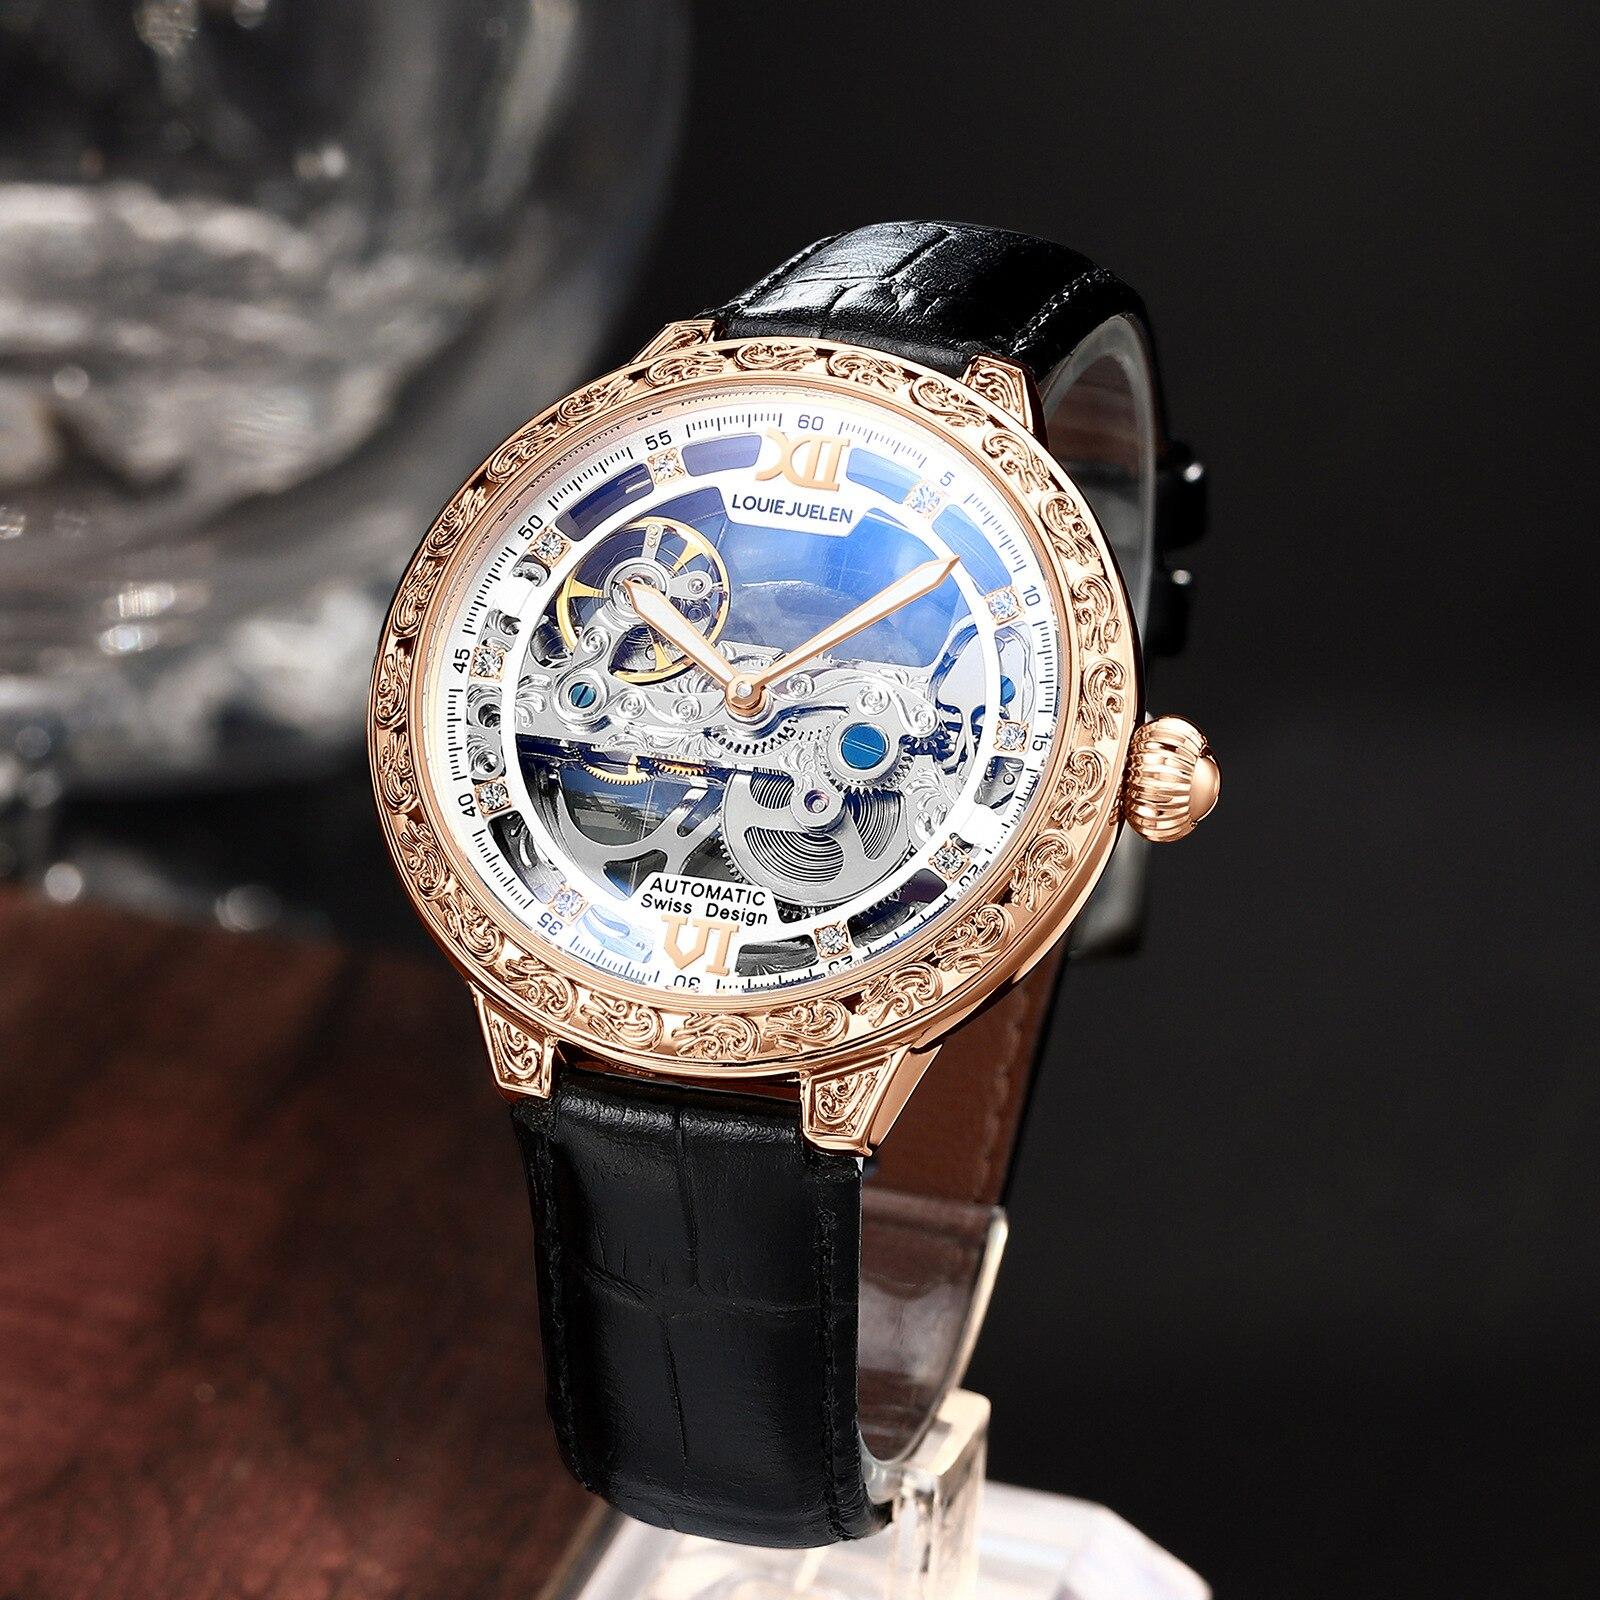 The New Men's Mechanical Sports Watch Hollow Mechanical Watch Men's Watch Fashion Night Light Watch